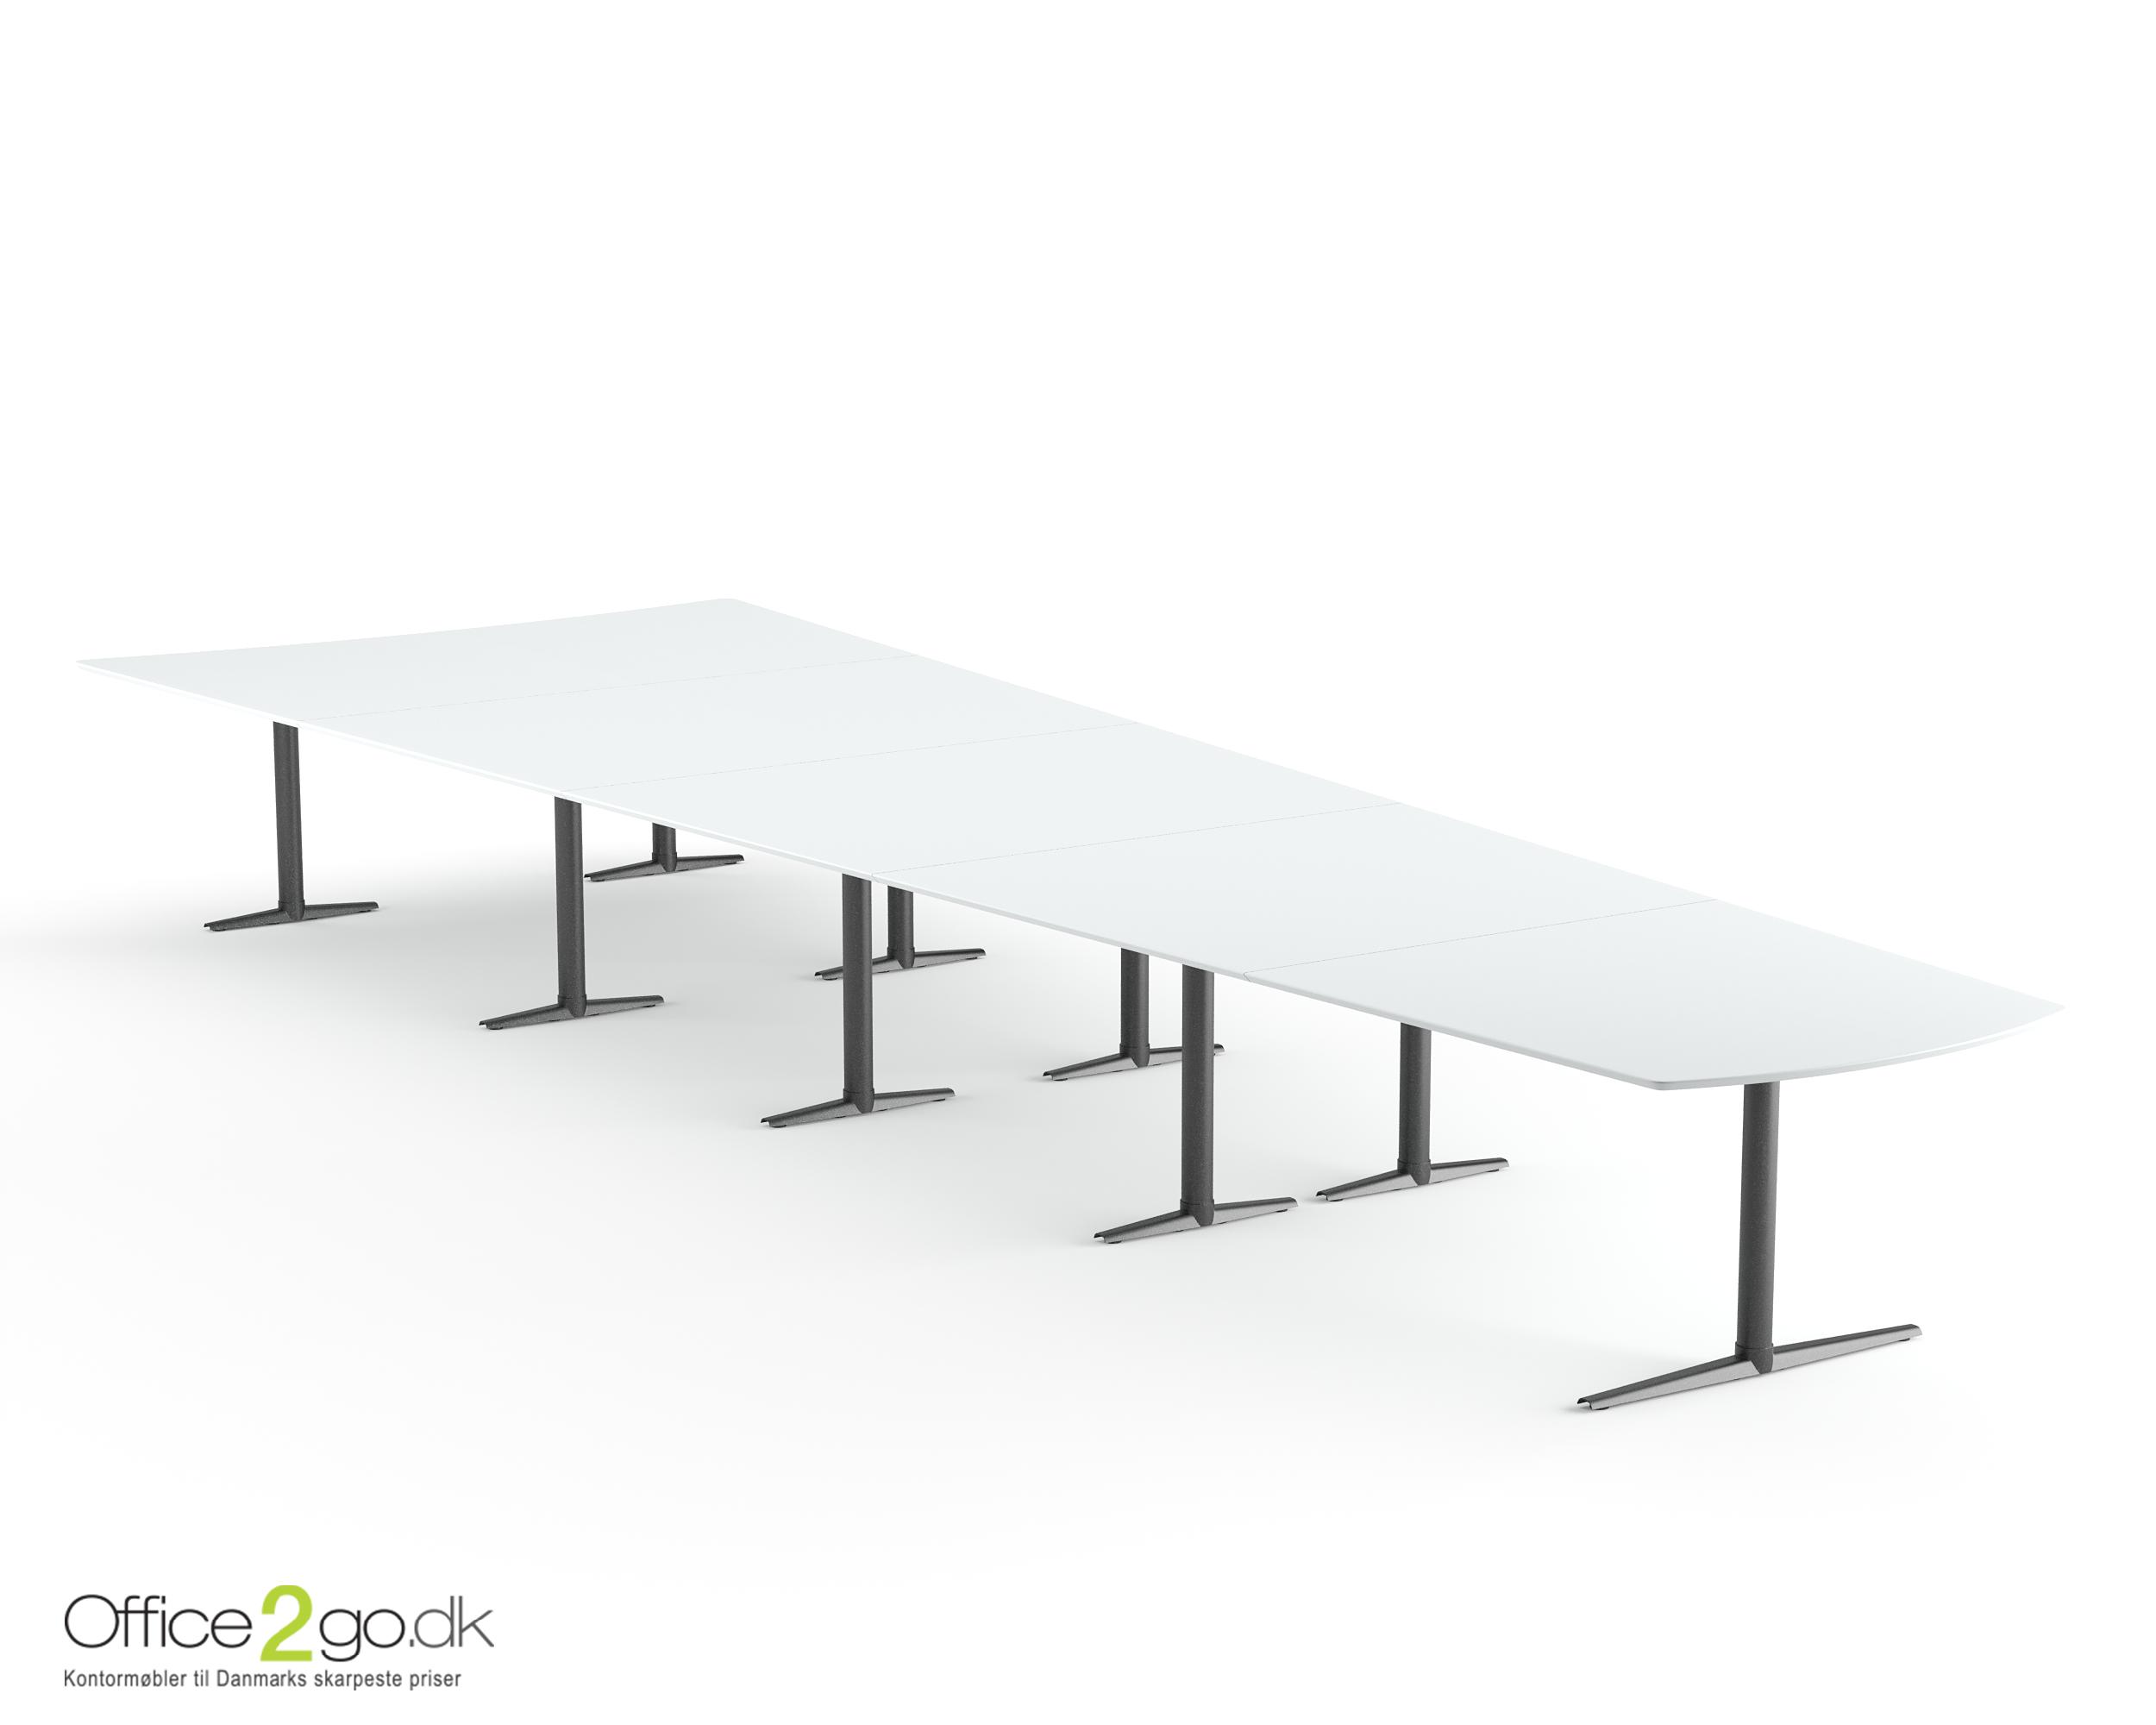 Switch Media mødebord - 20 personer - 625 cm.